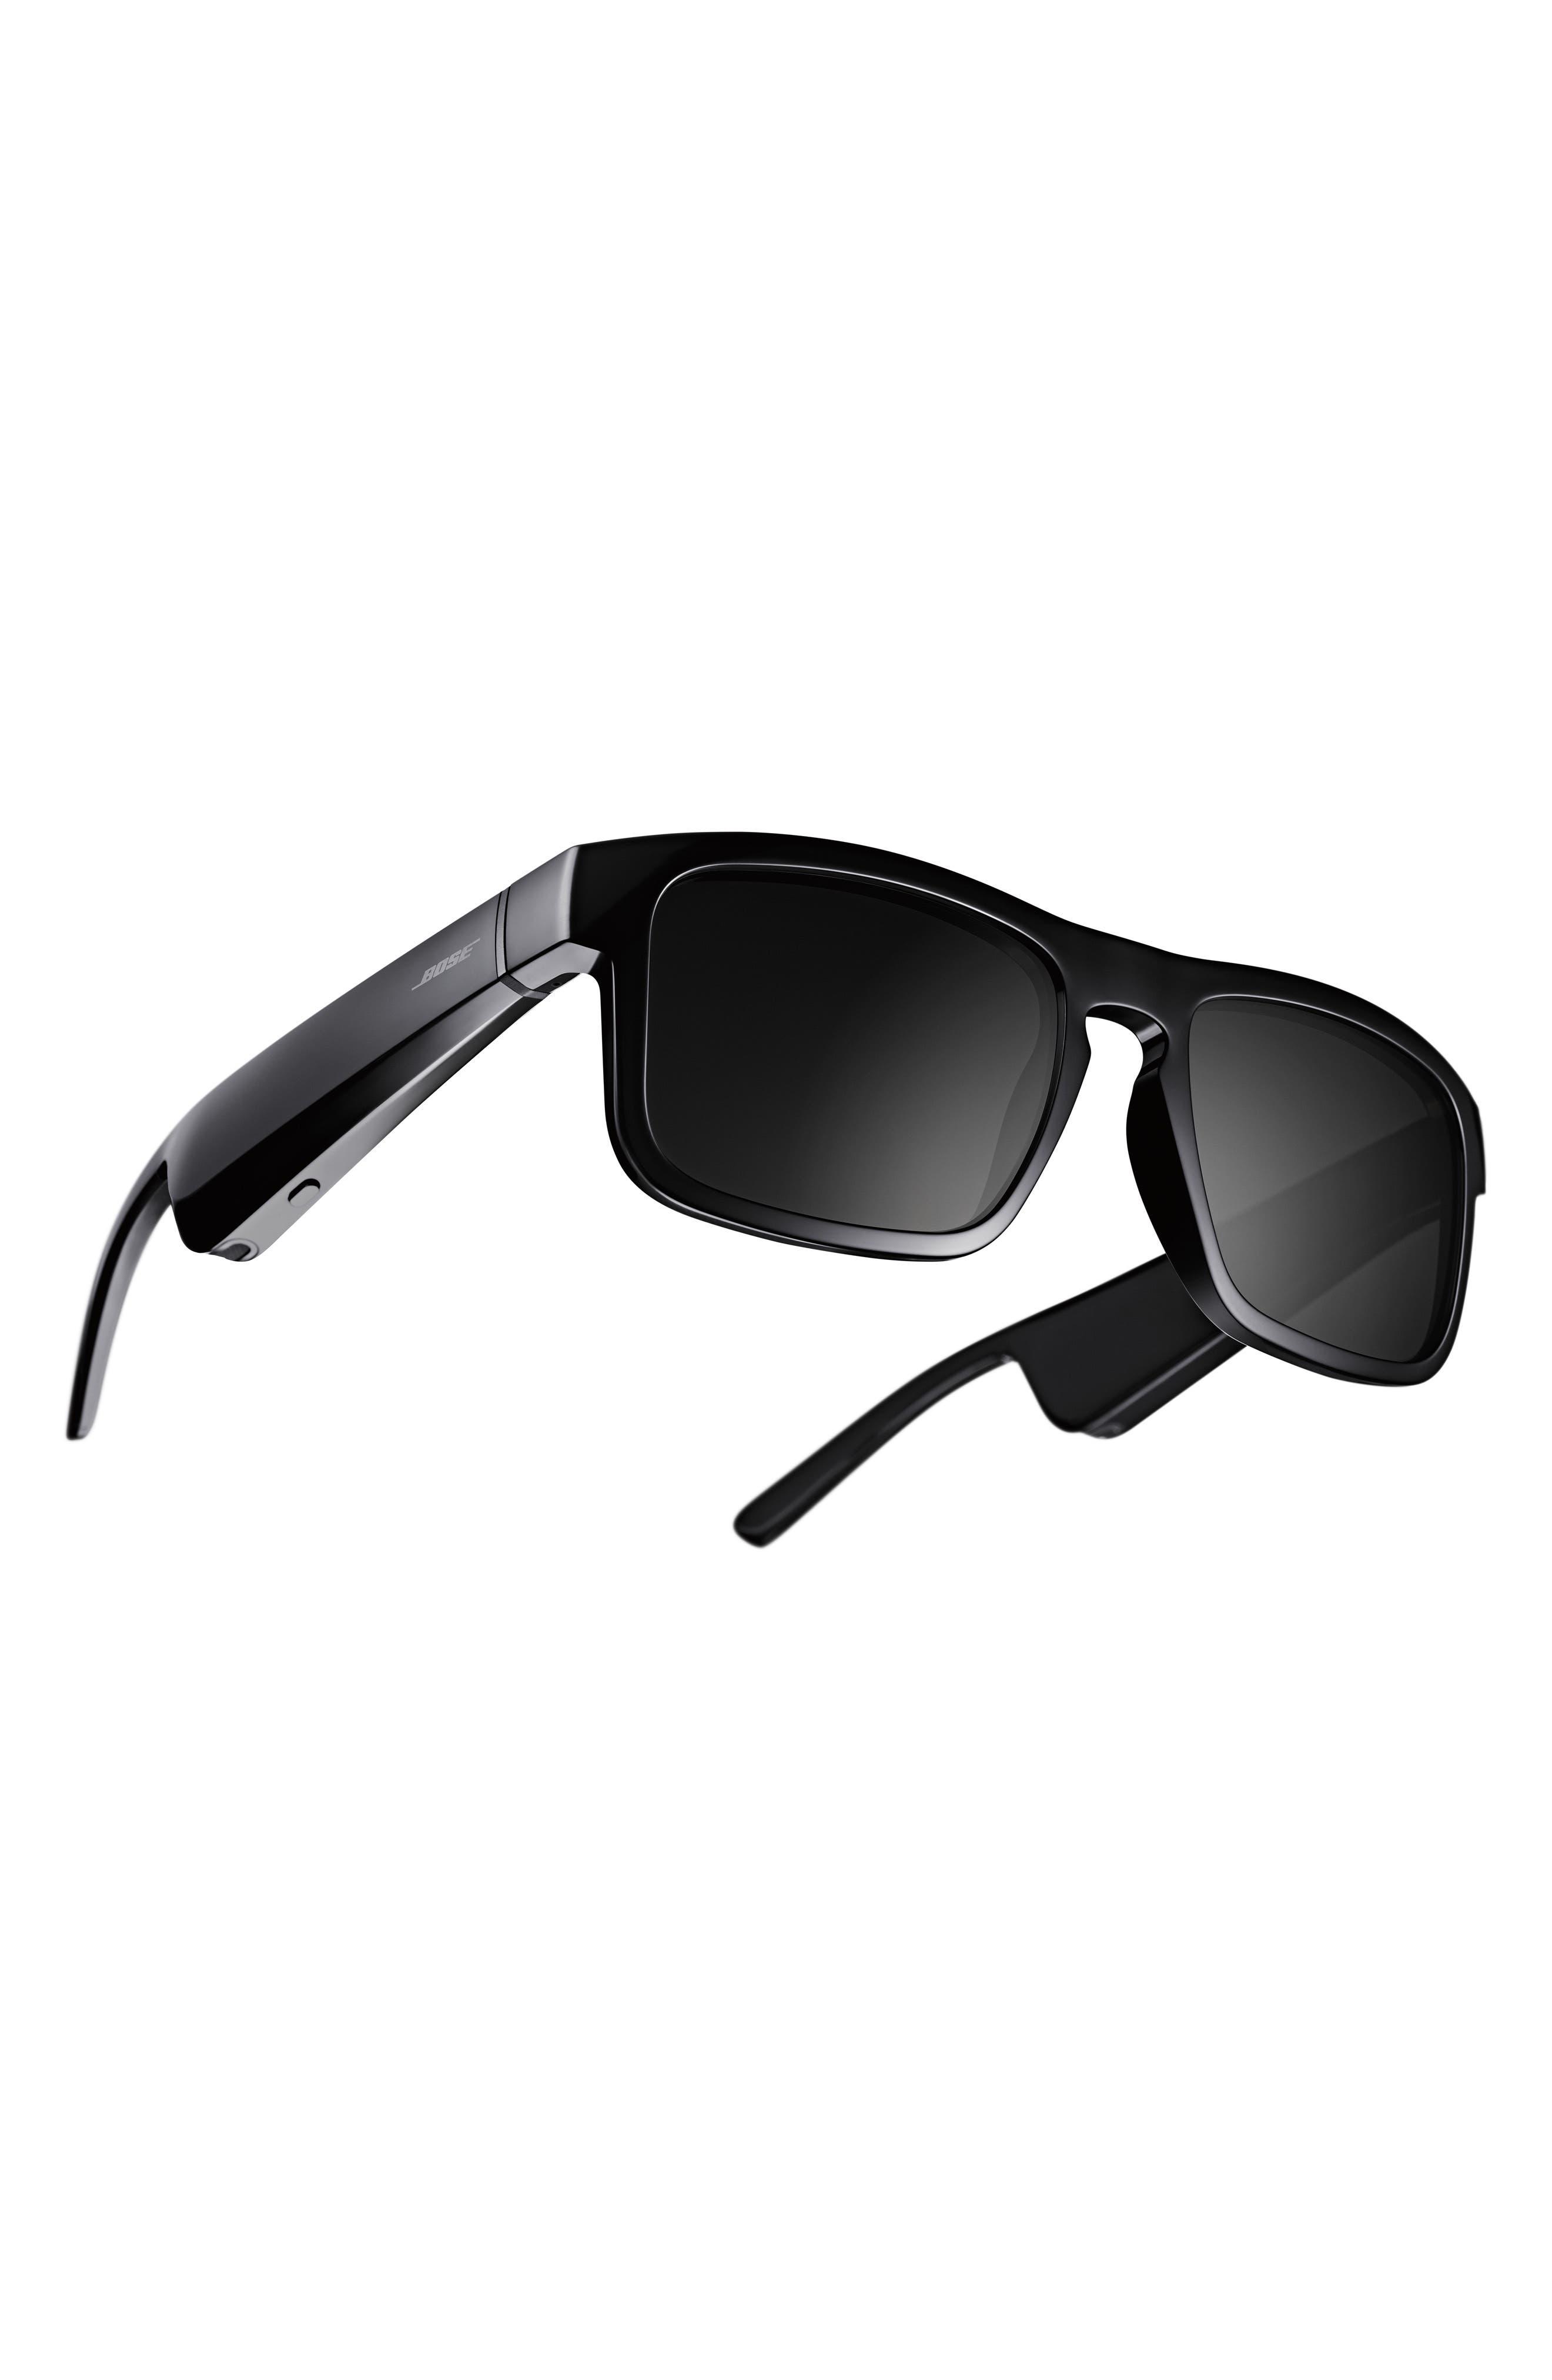 Men's Bose Frames Tenor 55mm Audio Sunglasses